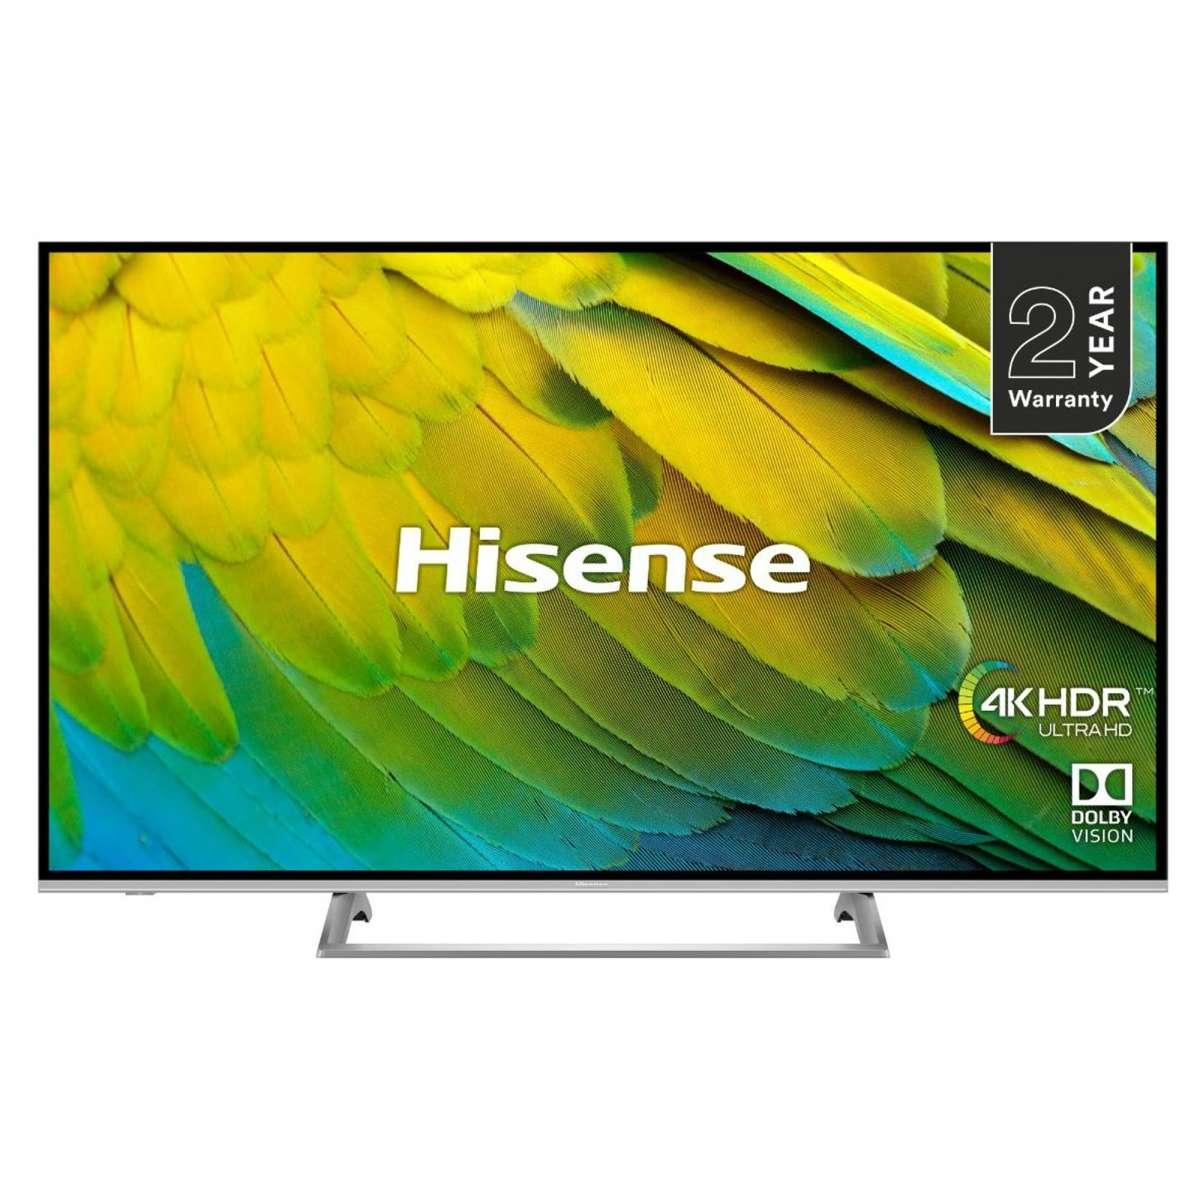 "Hisense H43B7500UK 43"" 4K HDR Certified Smart TV (More deals in post) (2 Year Warranty) £259 Delivered @ Hughes"